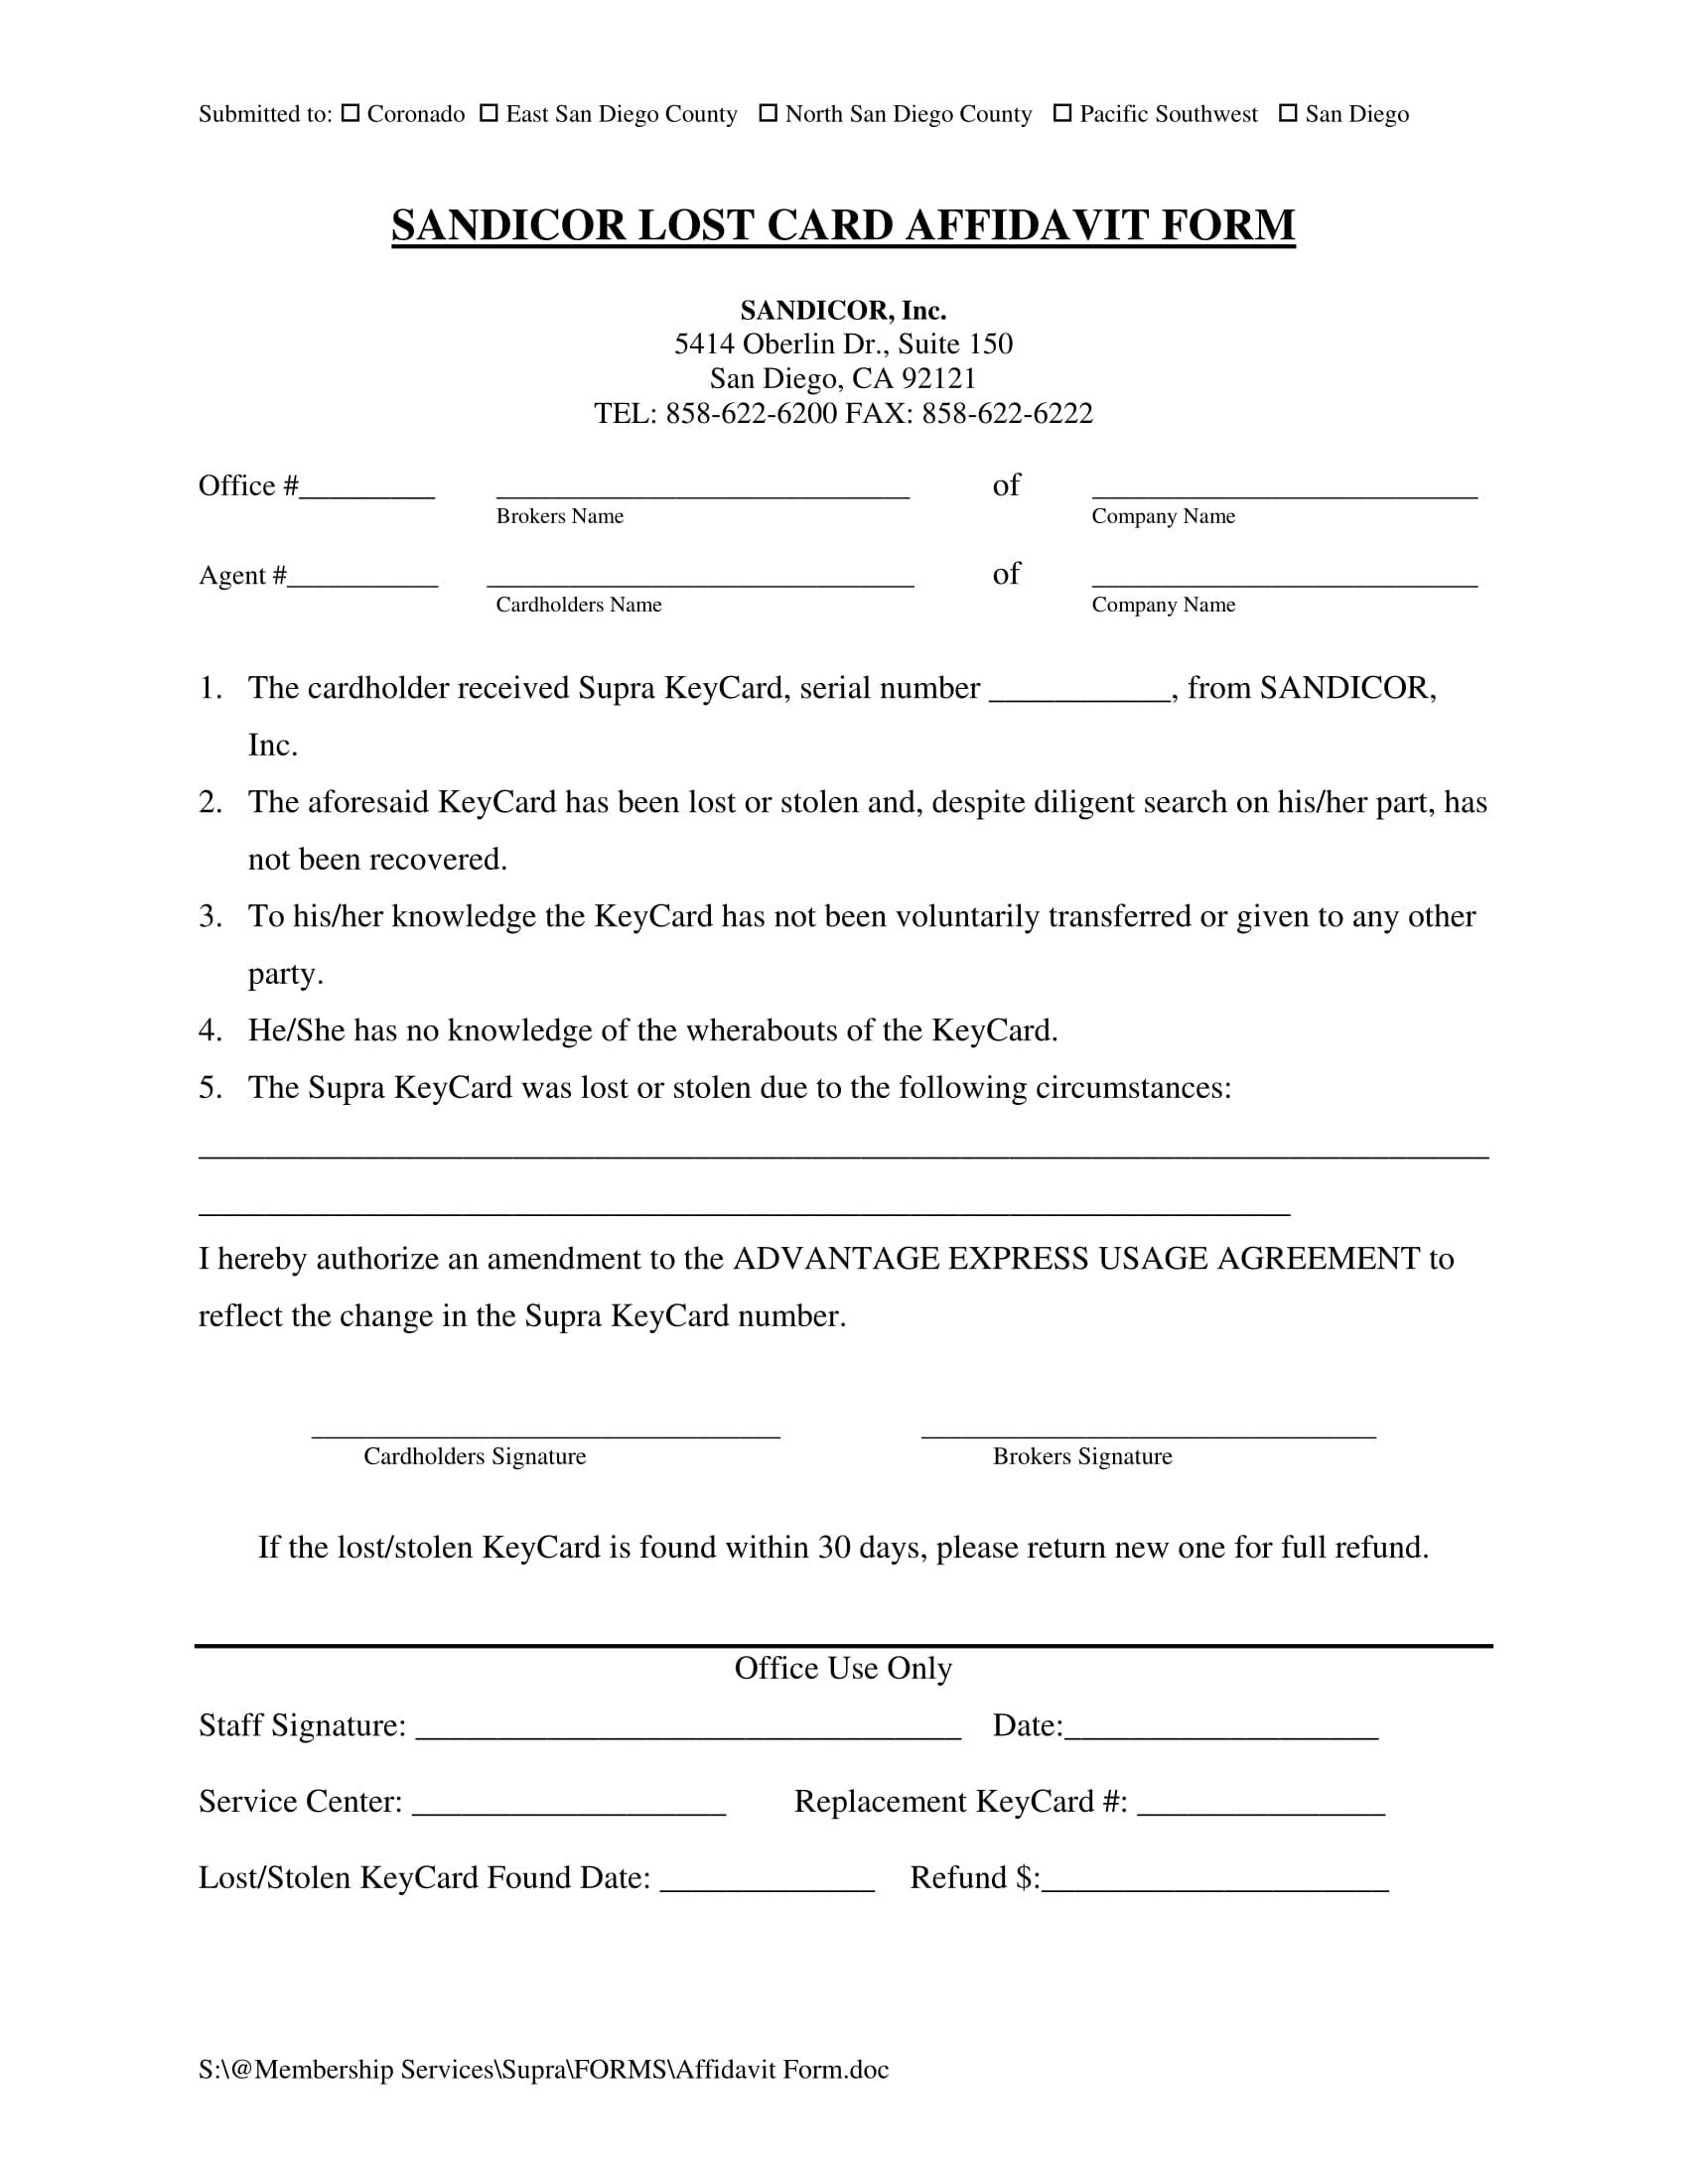 lost card affidavit sample format 1